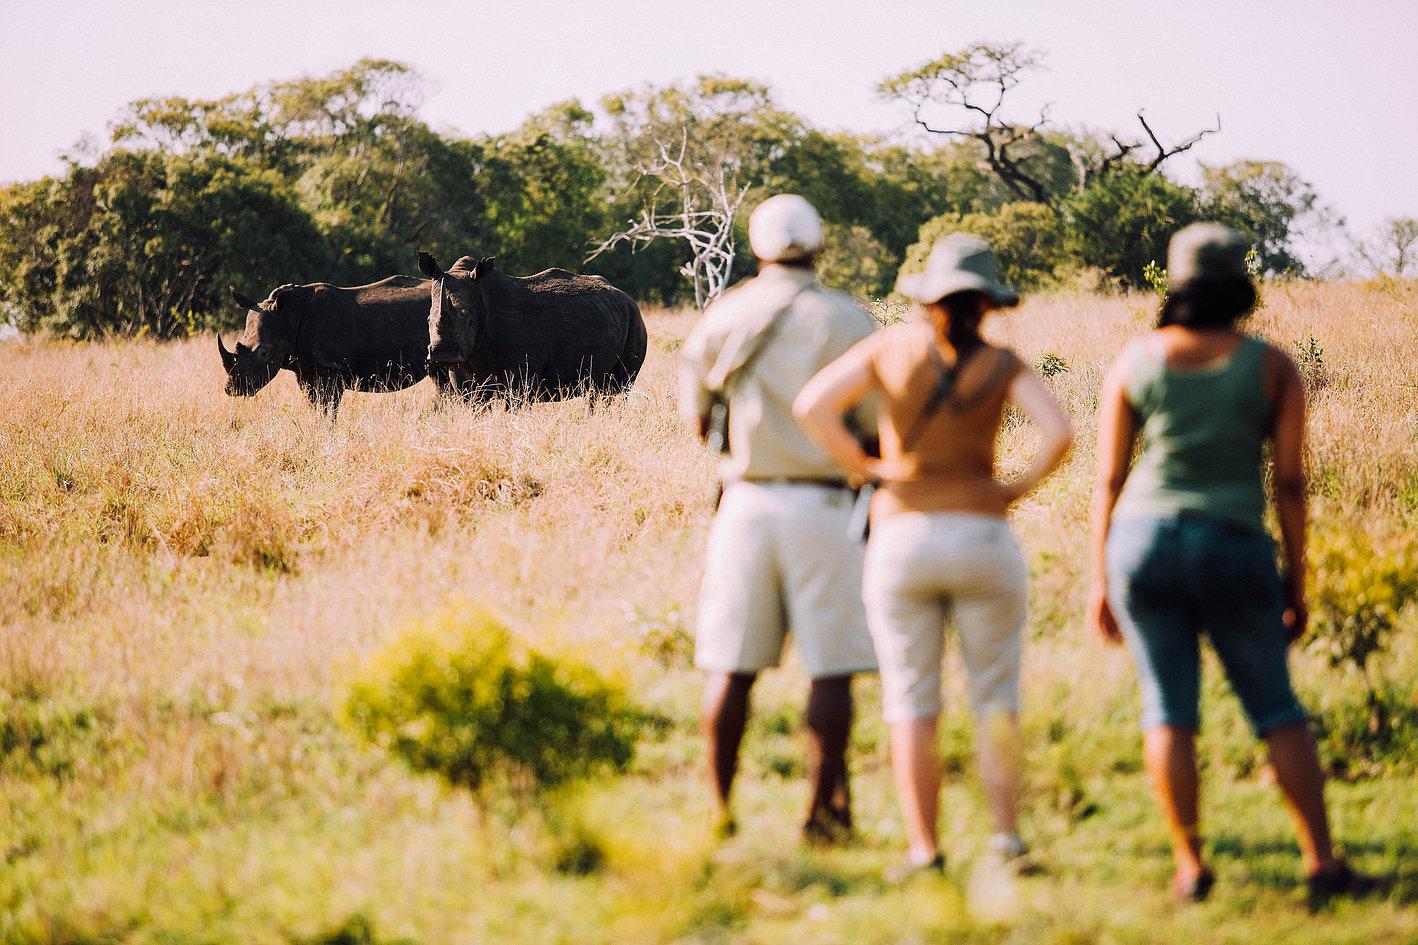 Rhino in Phinda Private Game Reserve